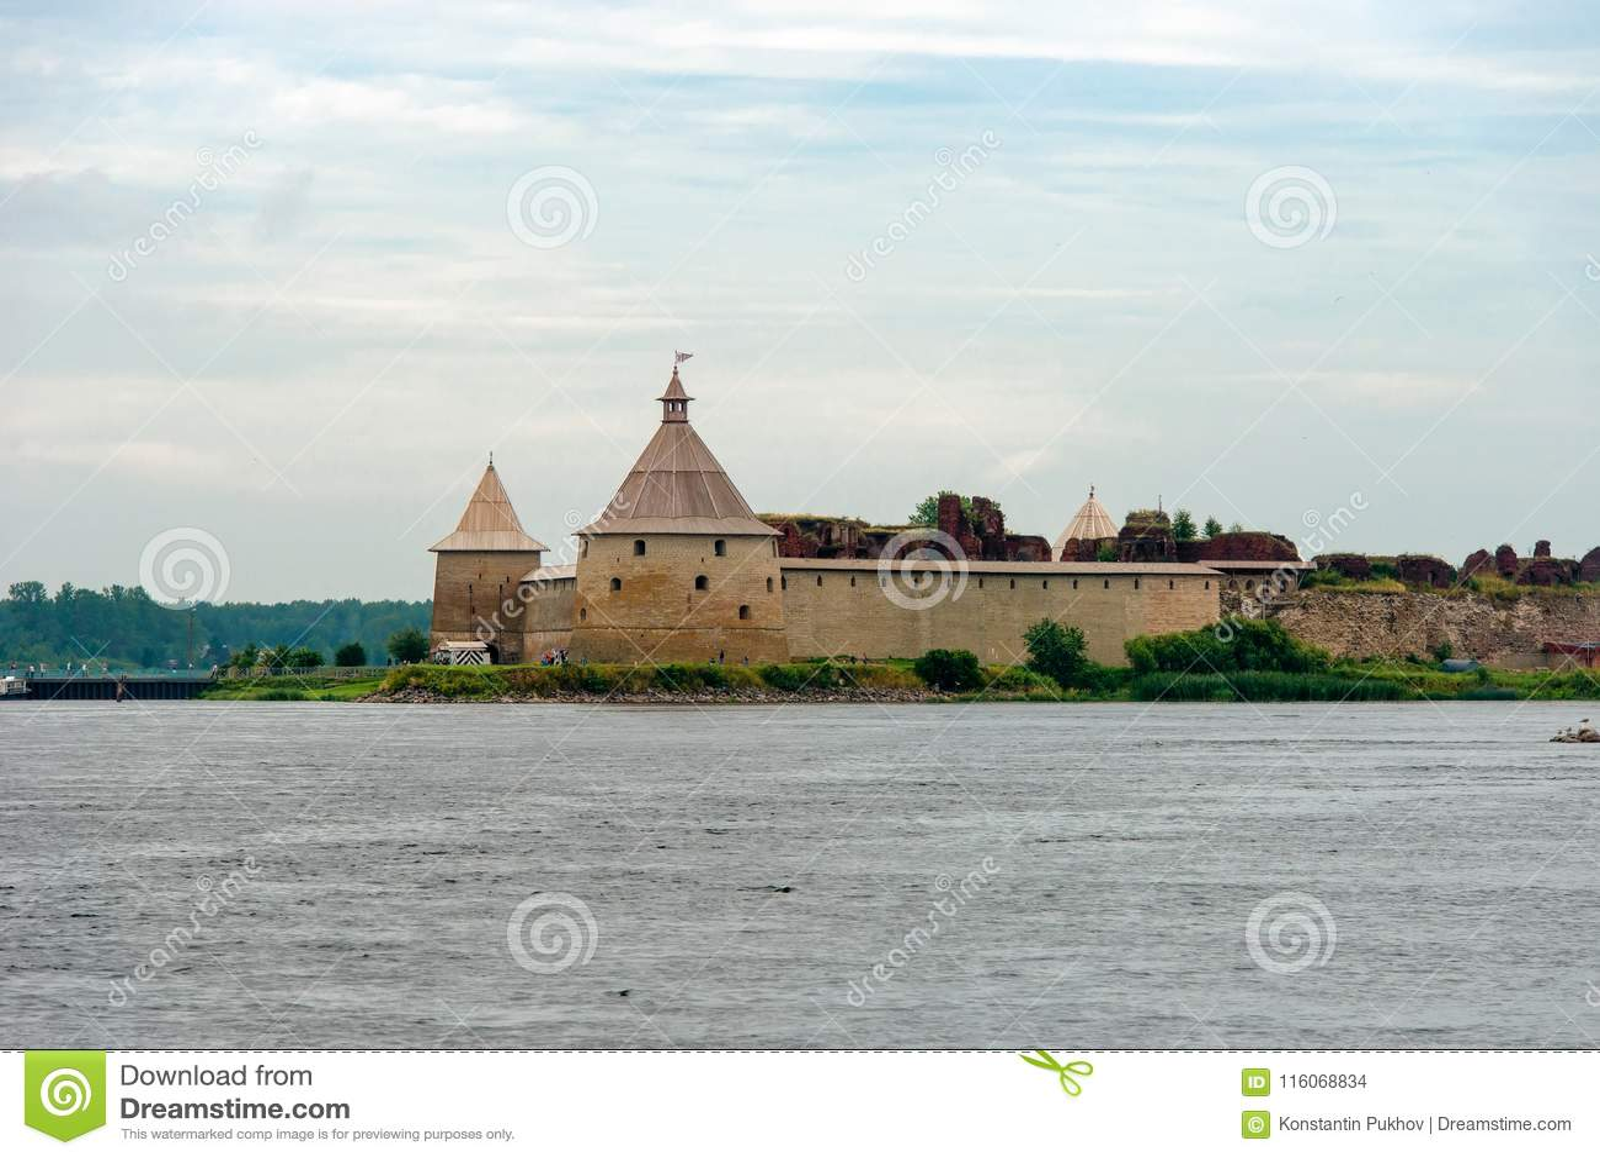 Fortress Oreshek